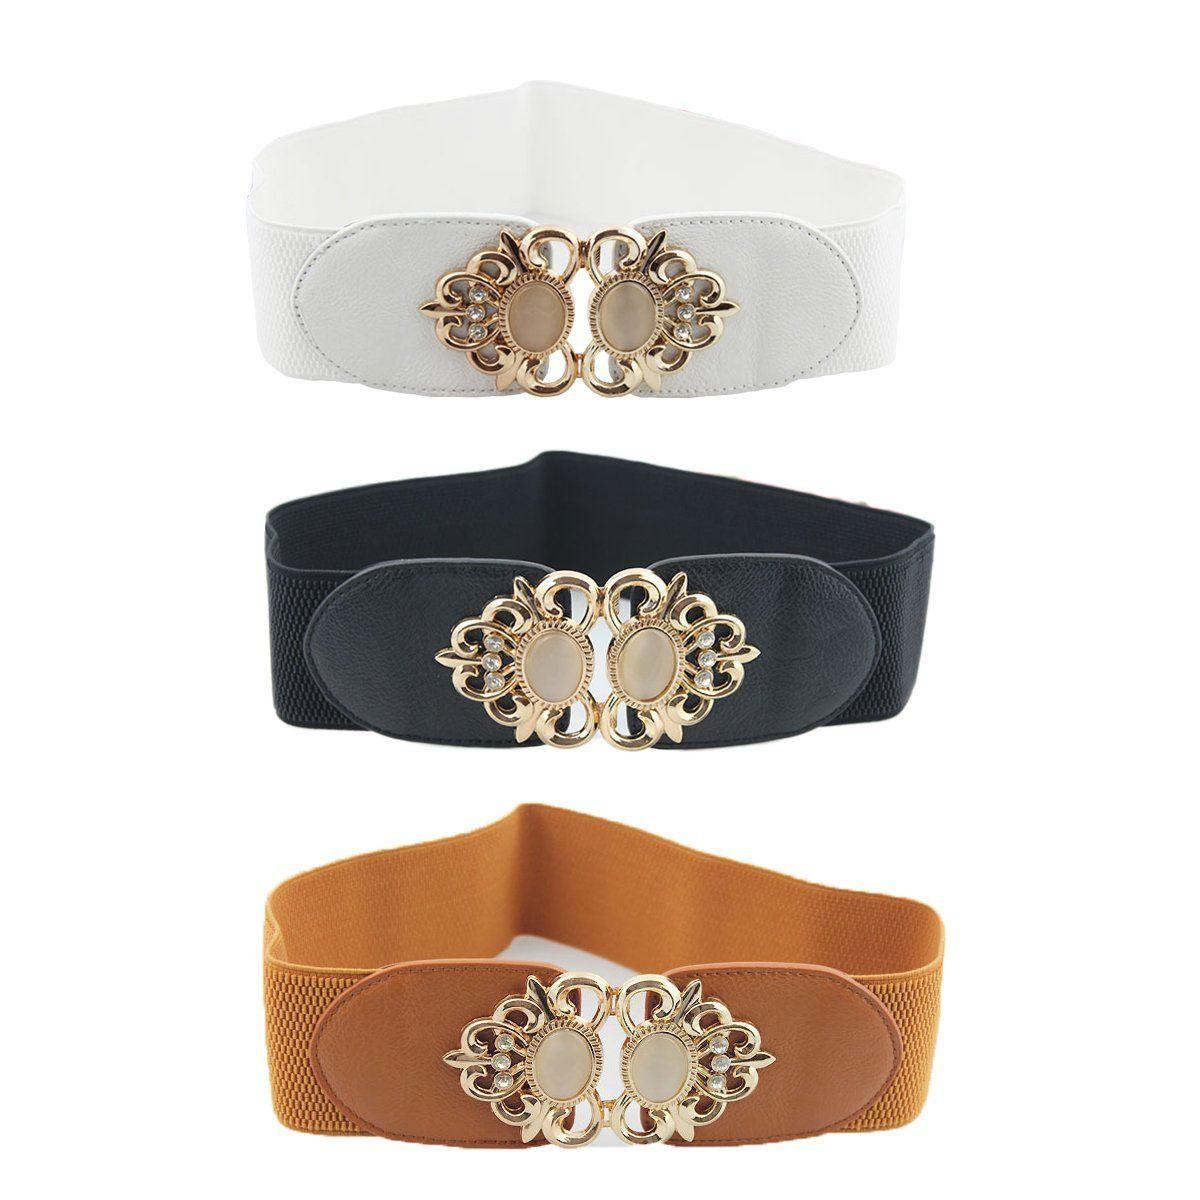 2 Pack Womens Vintage Waist Belt Wide Elastic Stretch Retro Cinch Belt